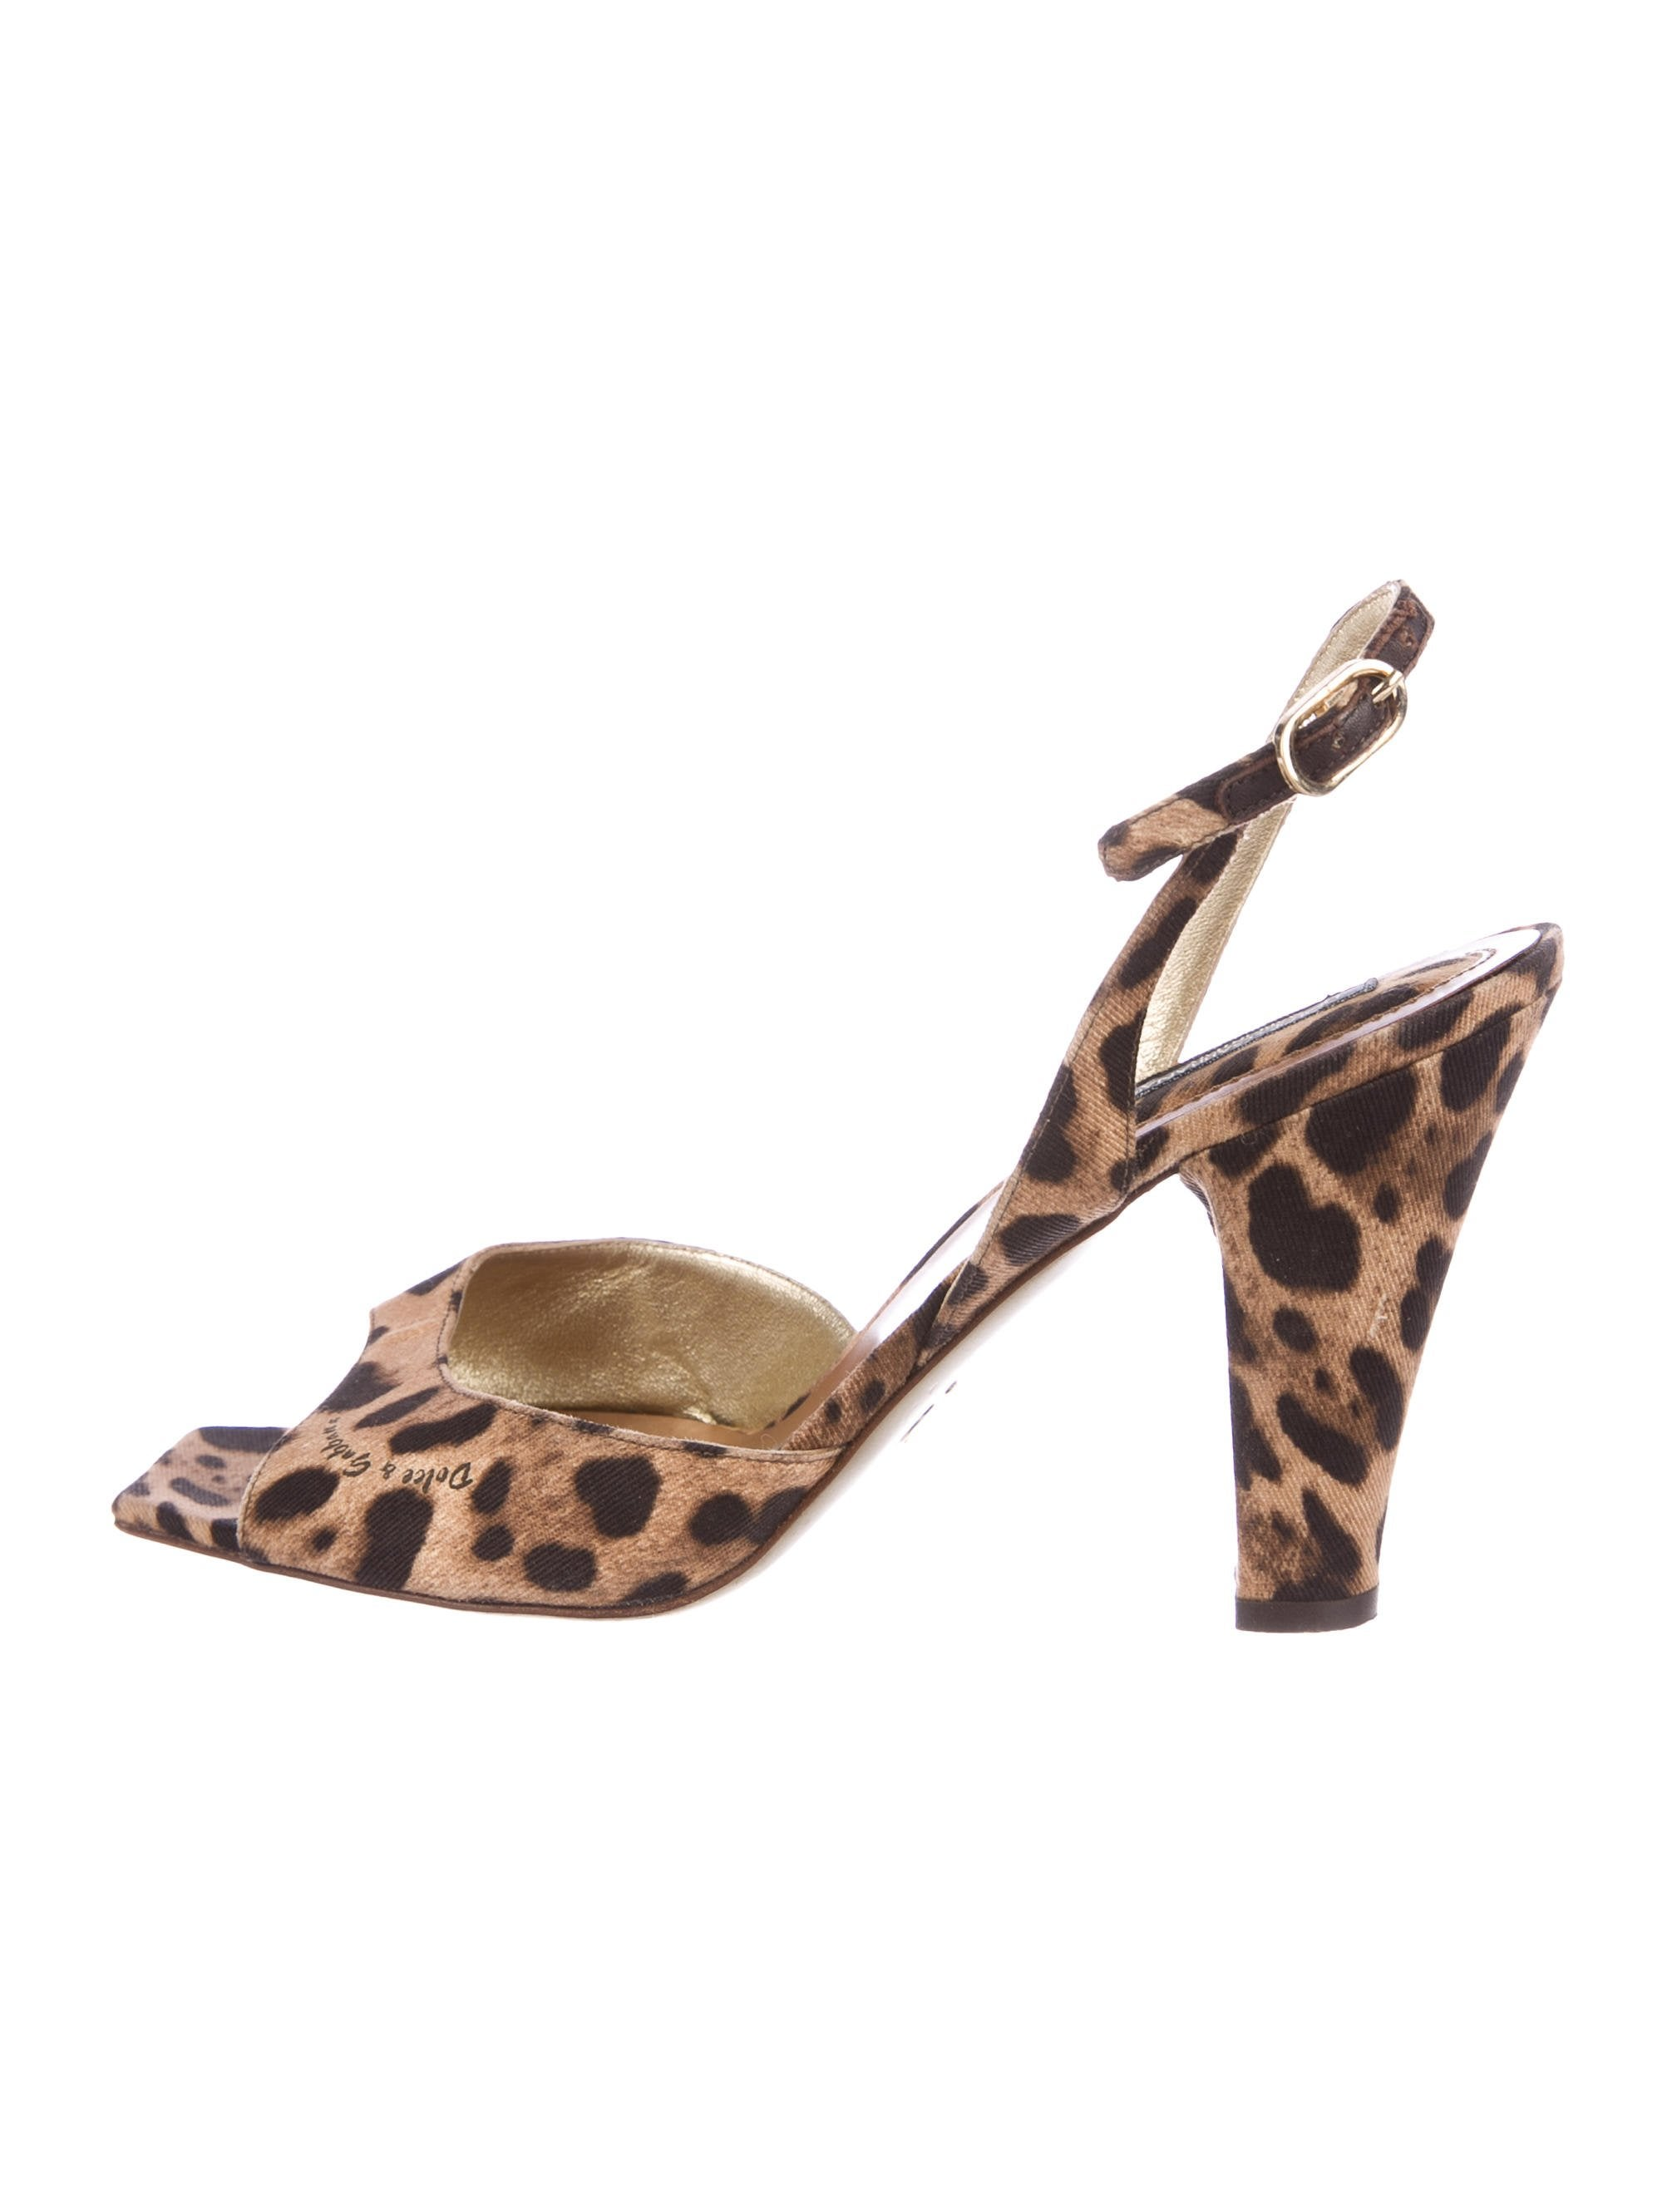 Dolce & Gabbana Canvas Slingback Sandals free shipping 100% original discount sast discount finishline sale best prices ibQbJ